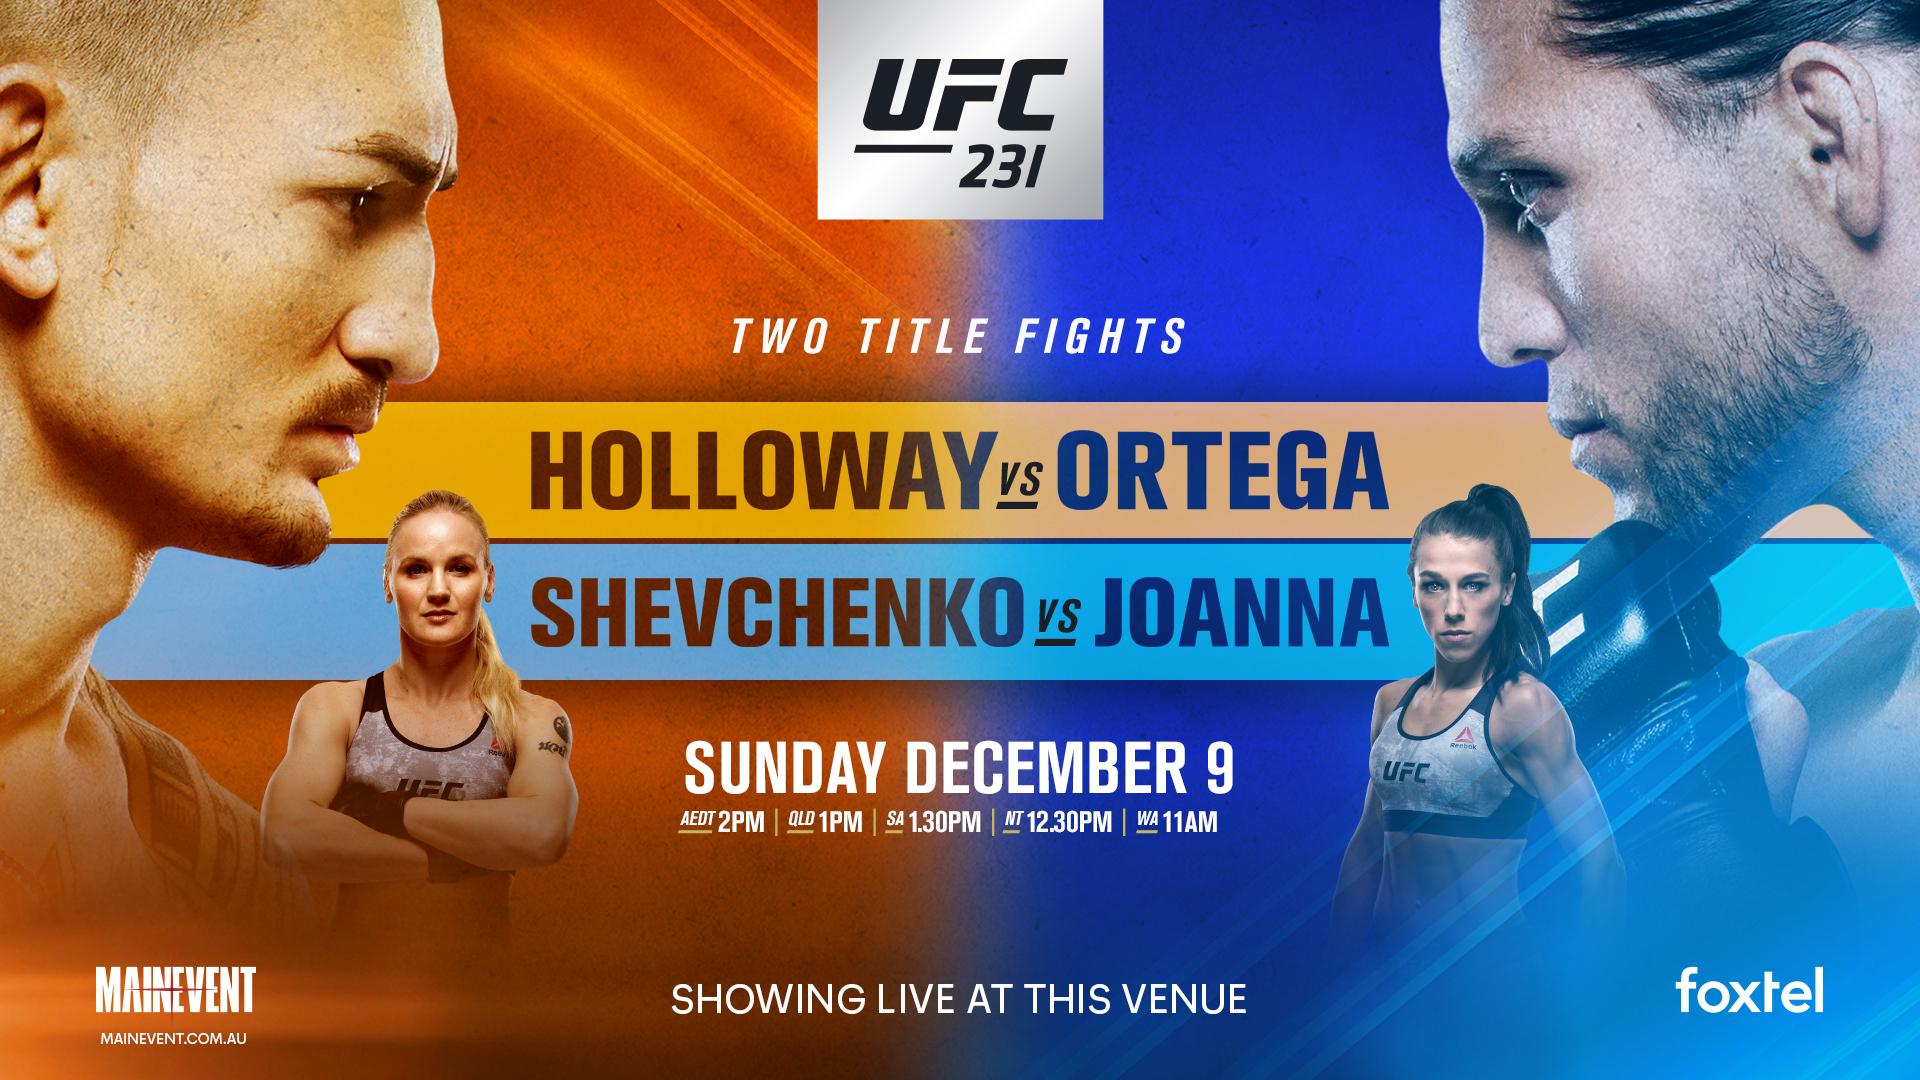 UFC231_FOXSPORTS_16x9_hori.jpg